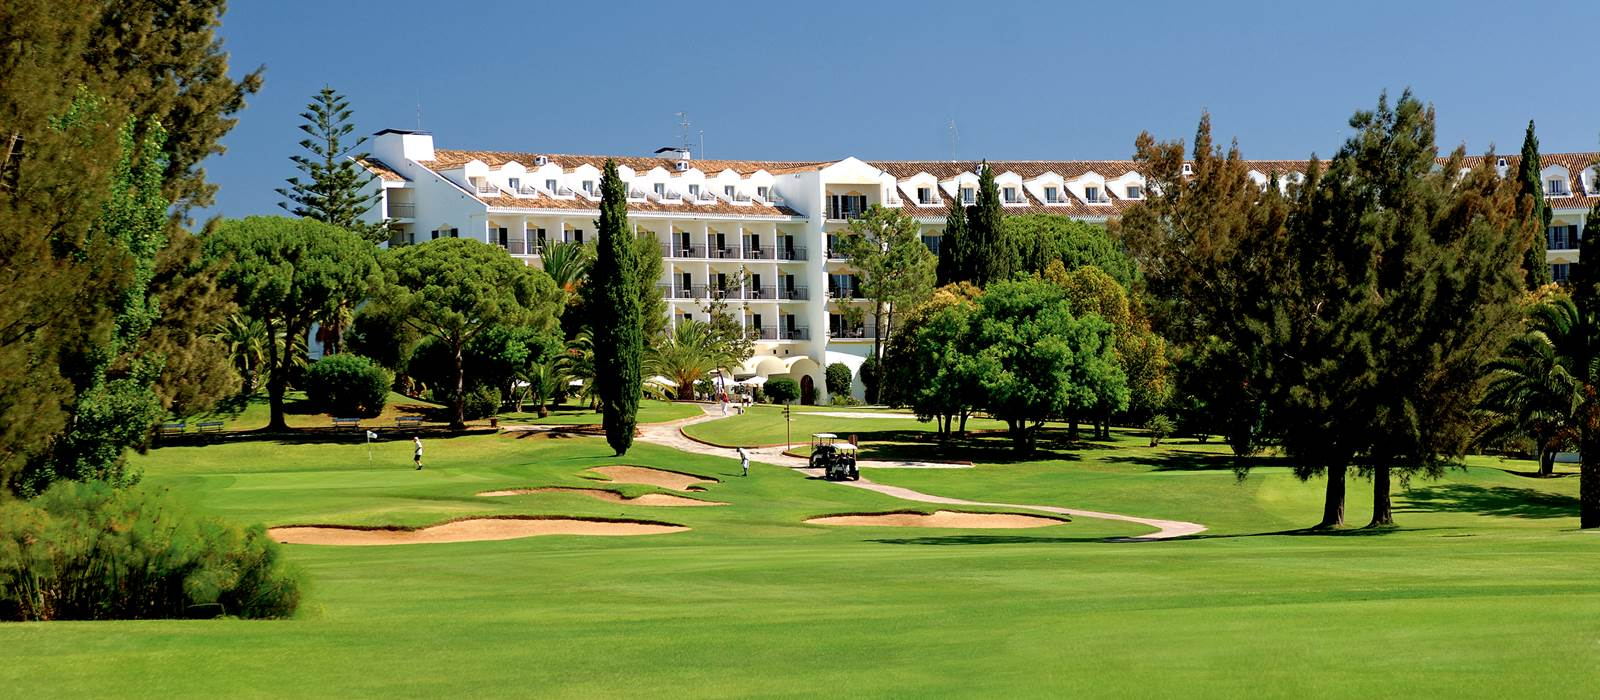 Exterior View Of Penina Hotel And Golf Resort